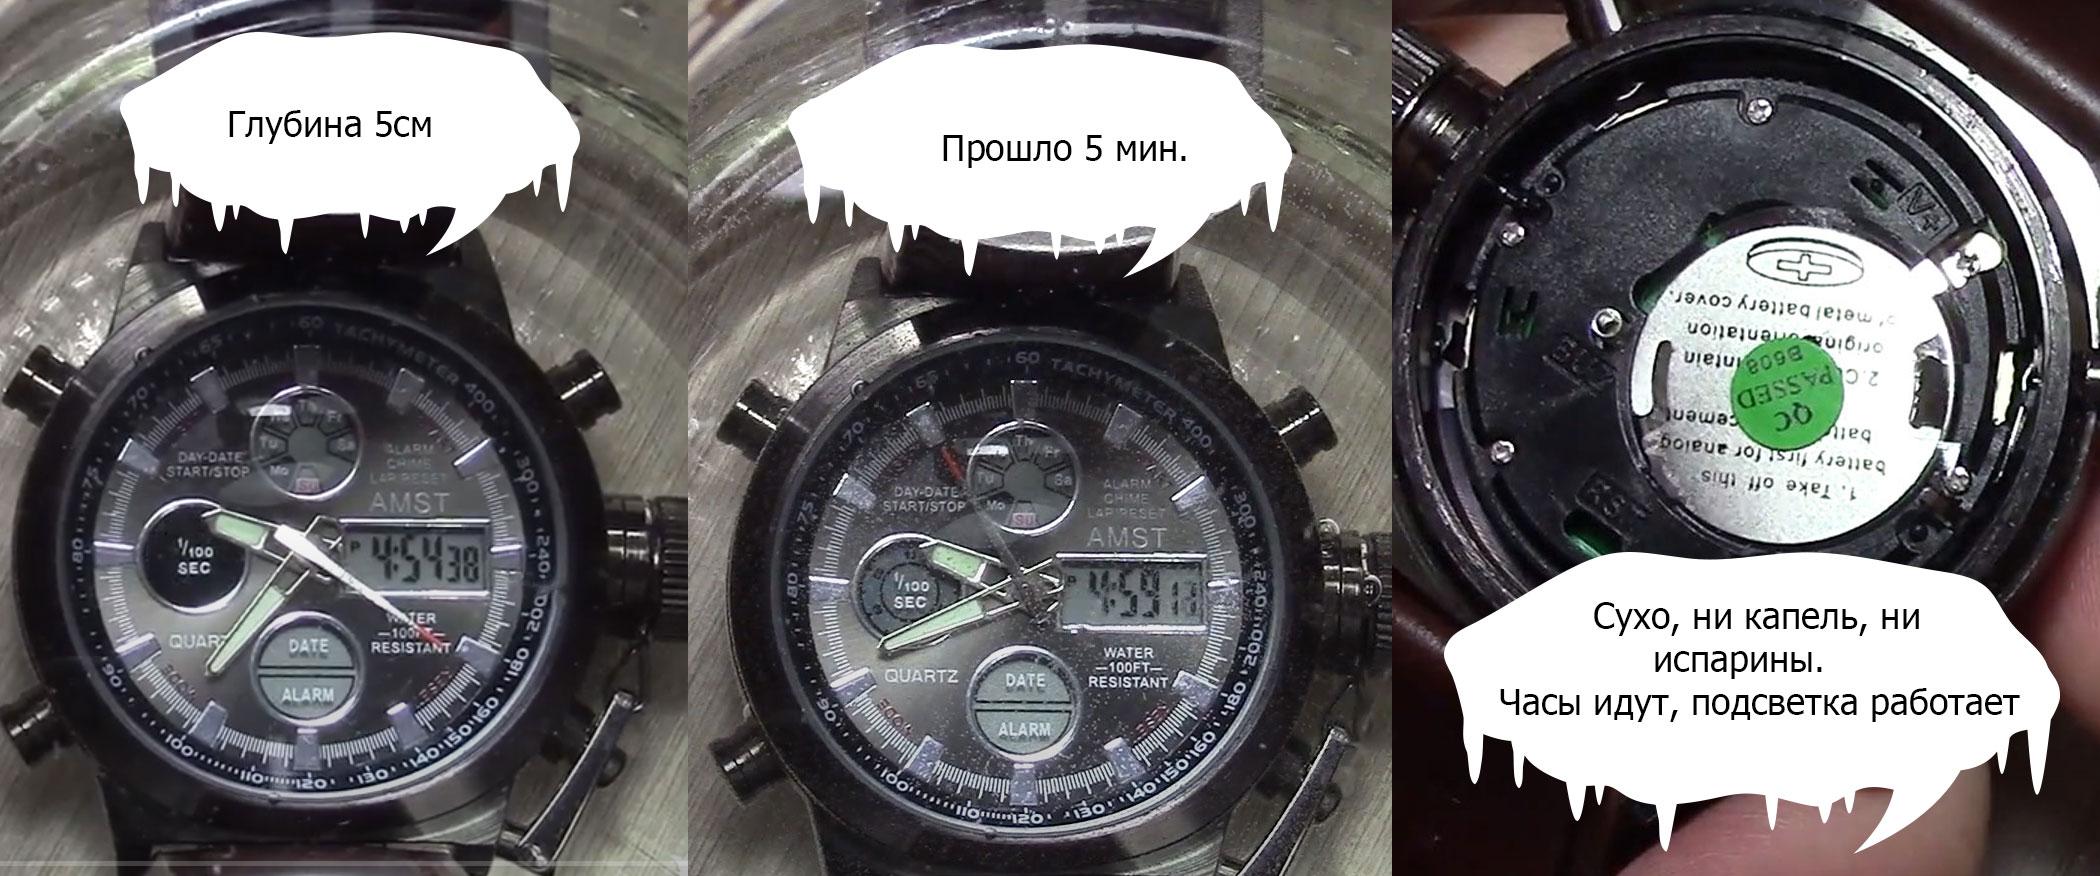 армейские часы amst оригинал